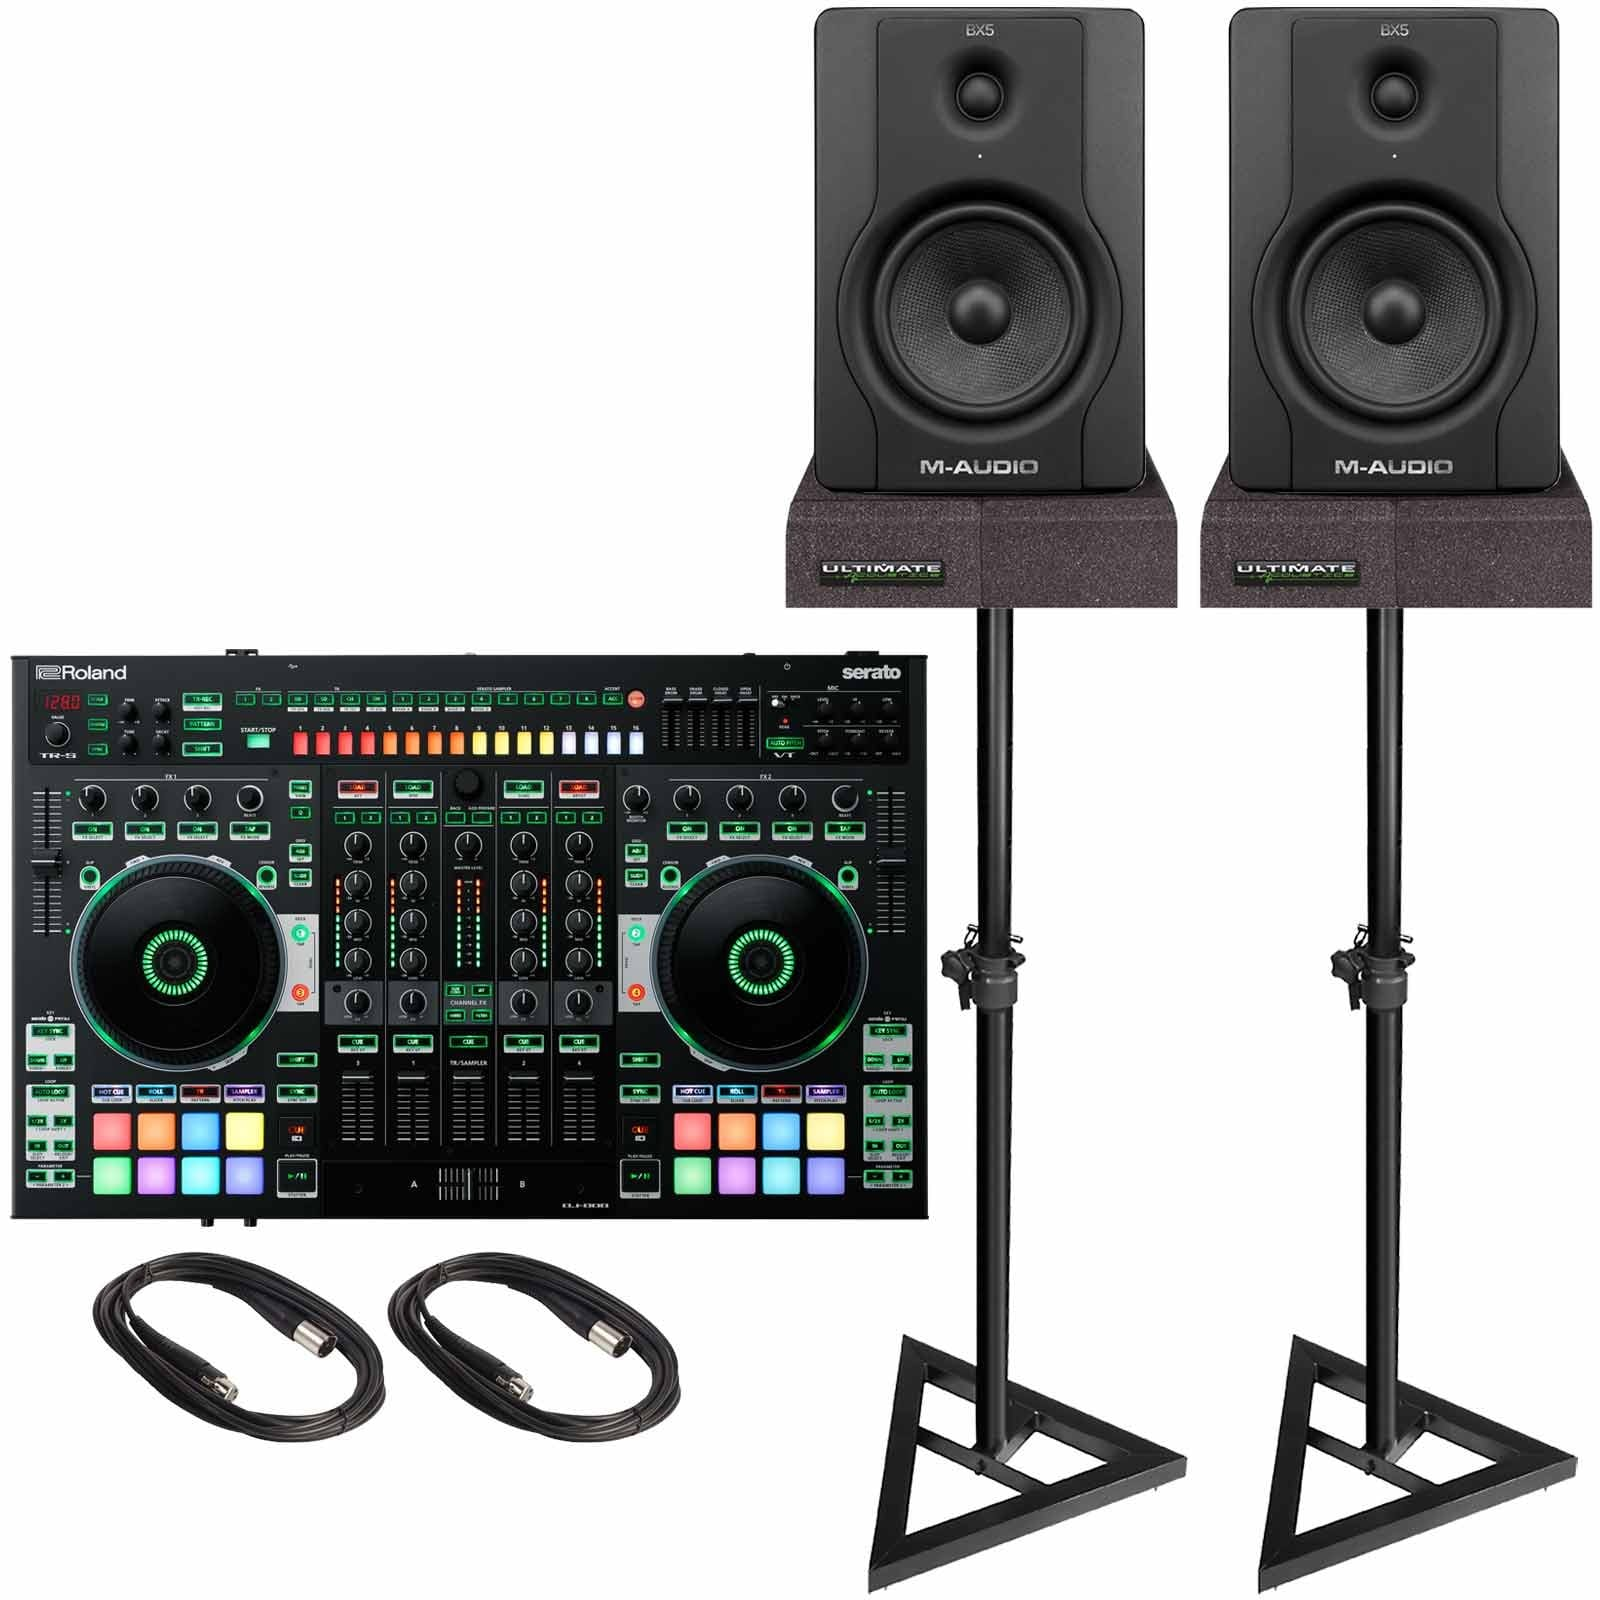 Roland DJ-808 4-Channel Mixer & DJ Controller with M-Audio ...